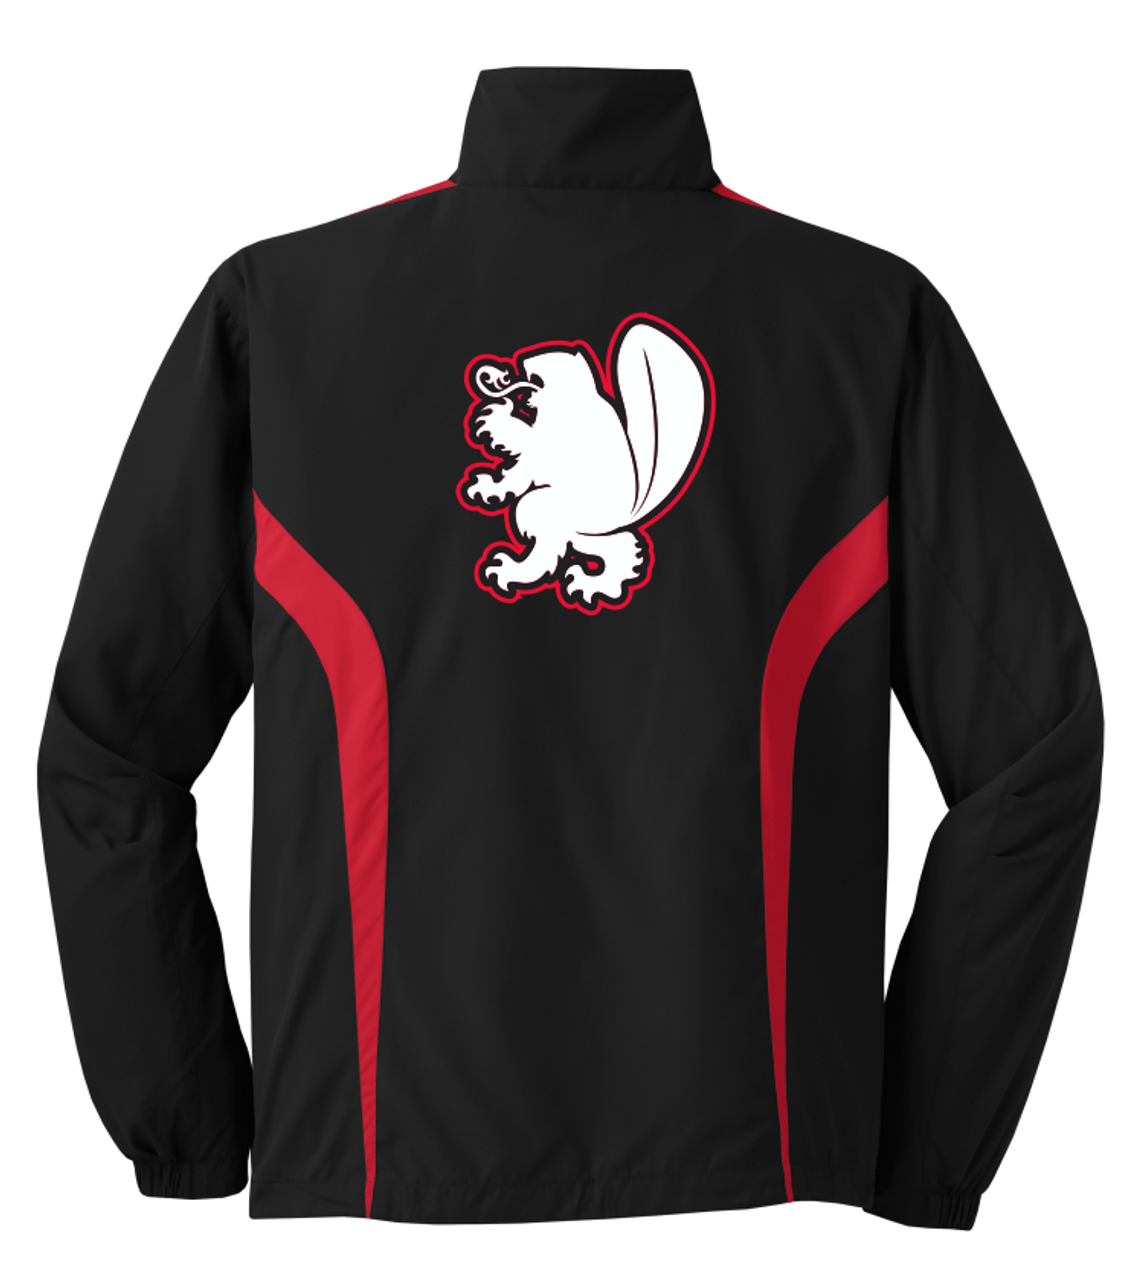 West Potomac Colorblock Jacket, Black/Red